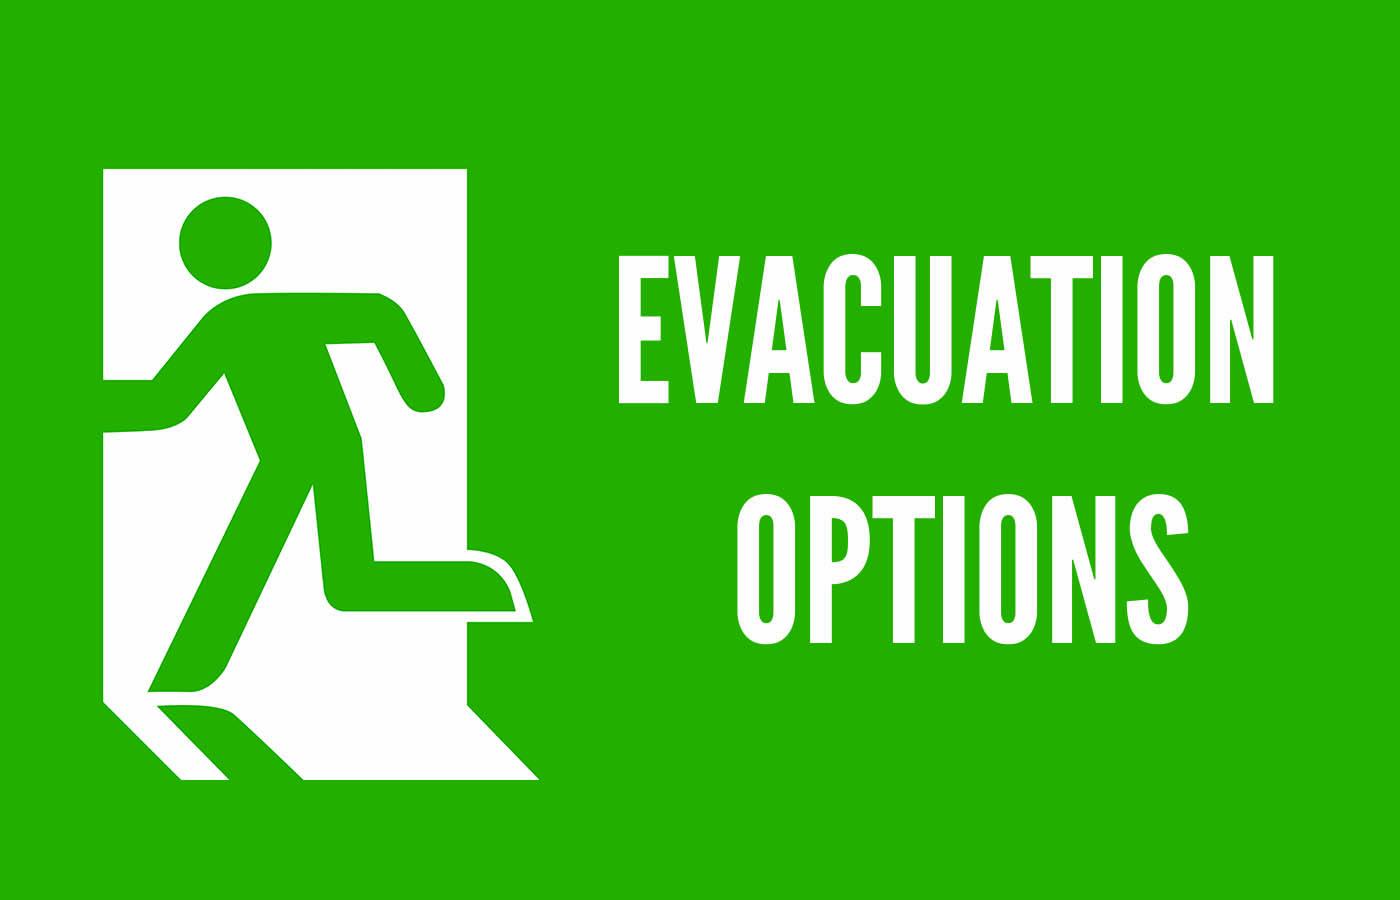 Evacuation Options